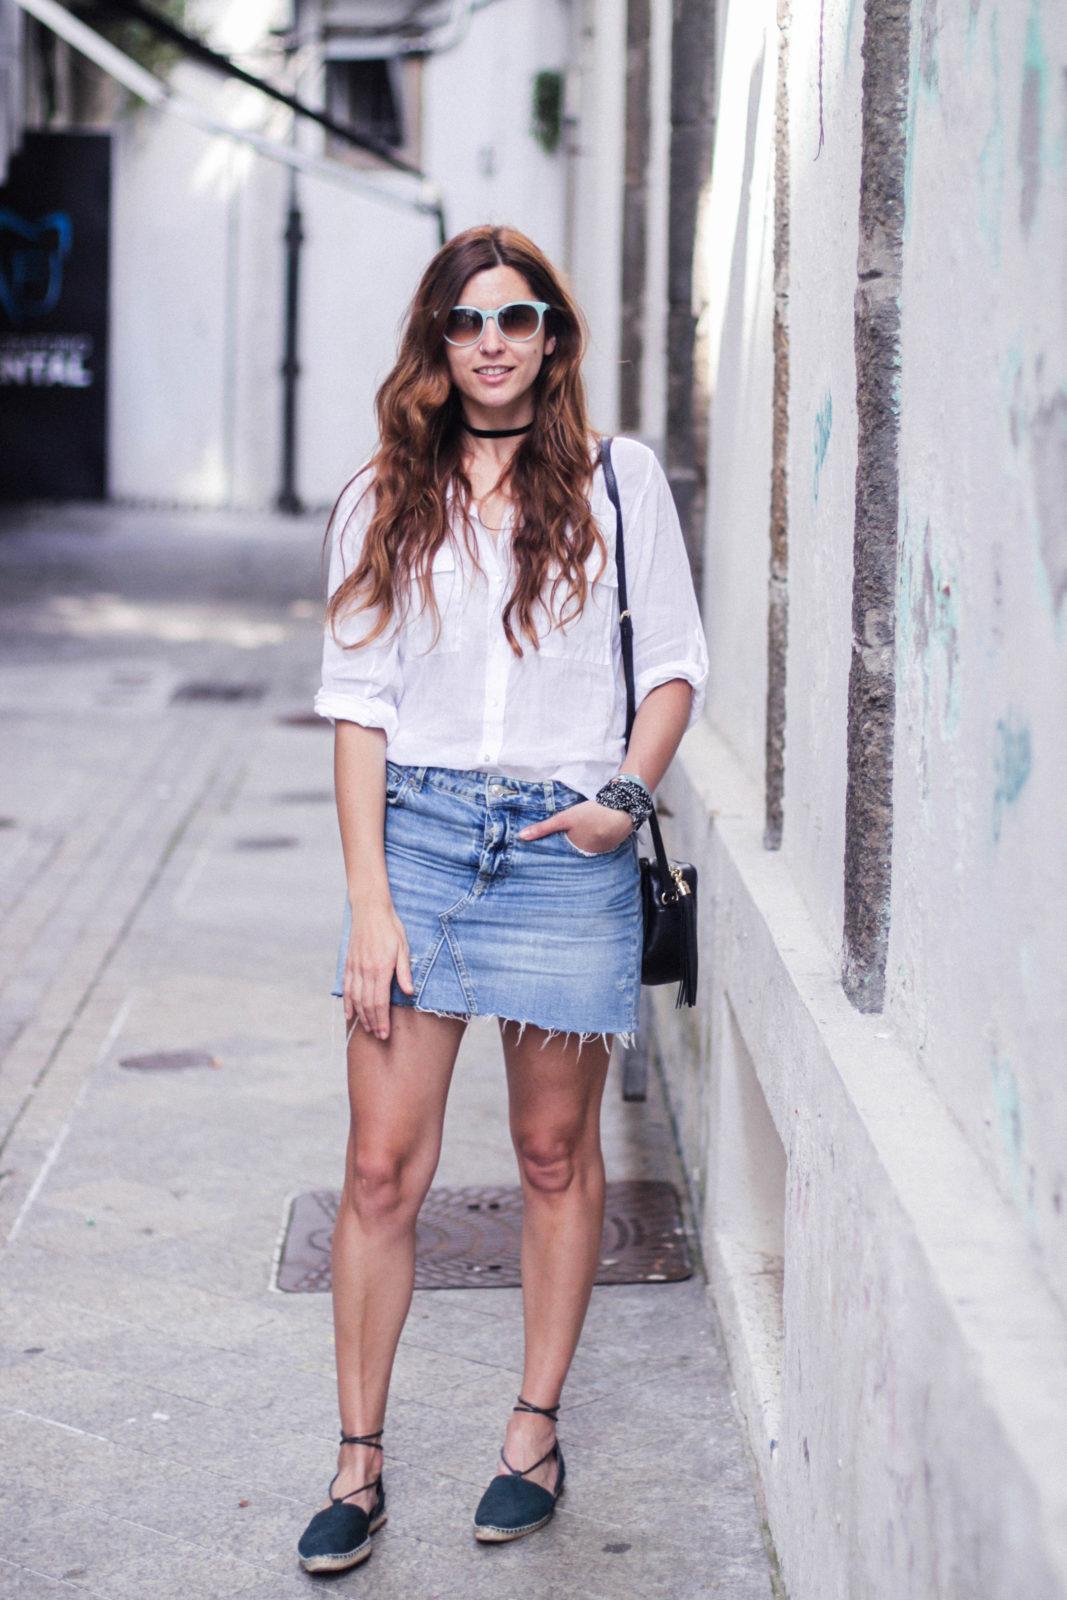 denim_skirt_falda_vaquera_camisa_blanca_alpargatas_espadrilles_look_summer_2016_street_style-23